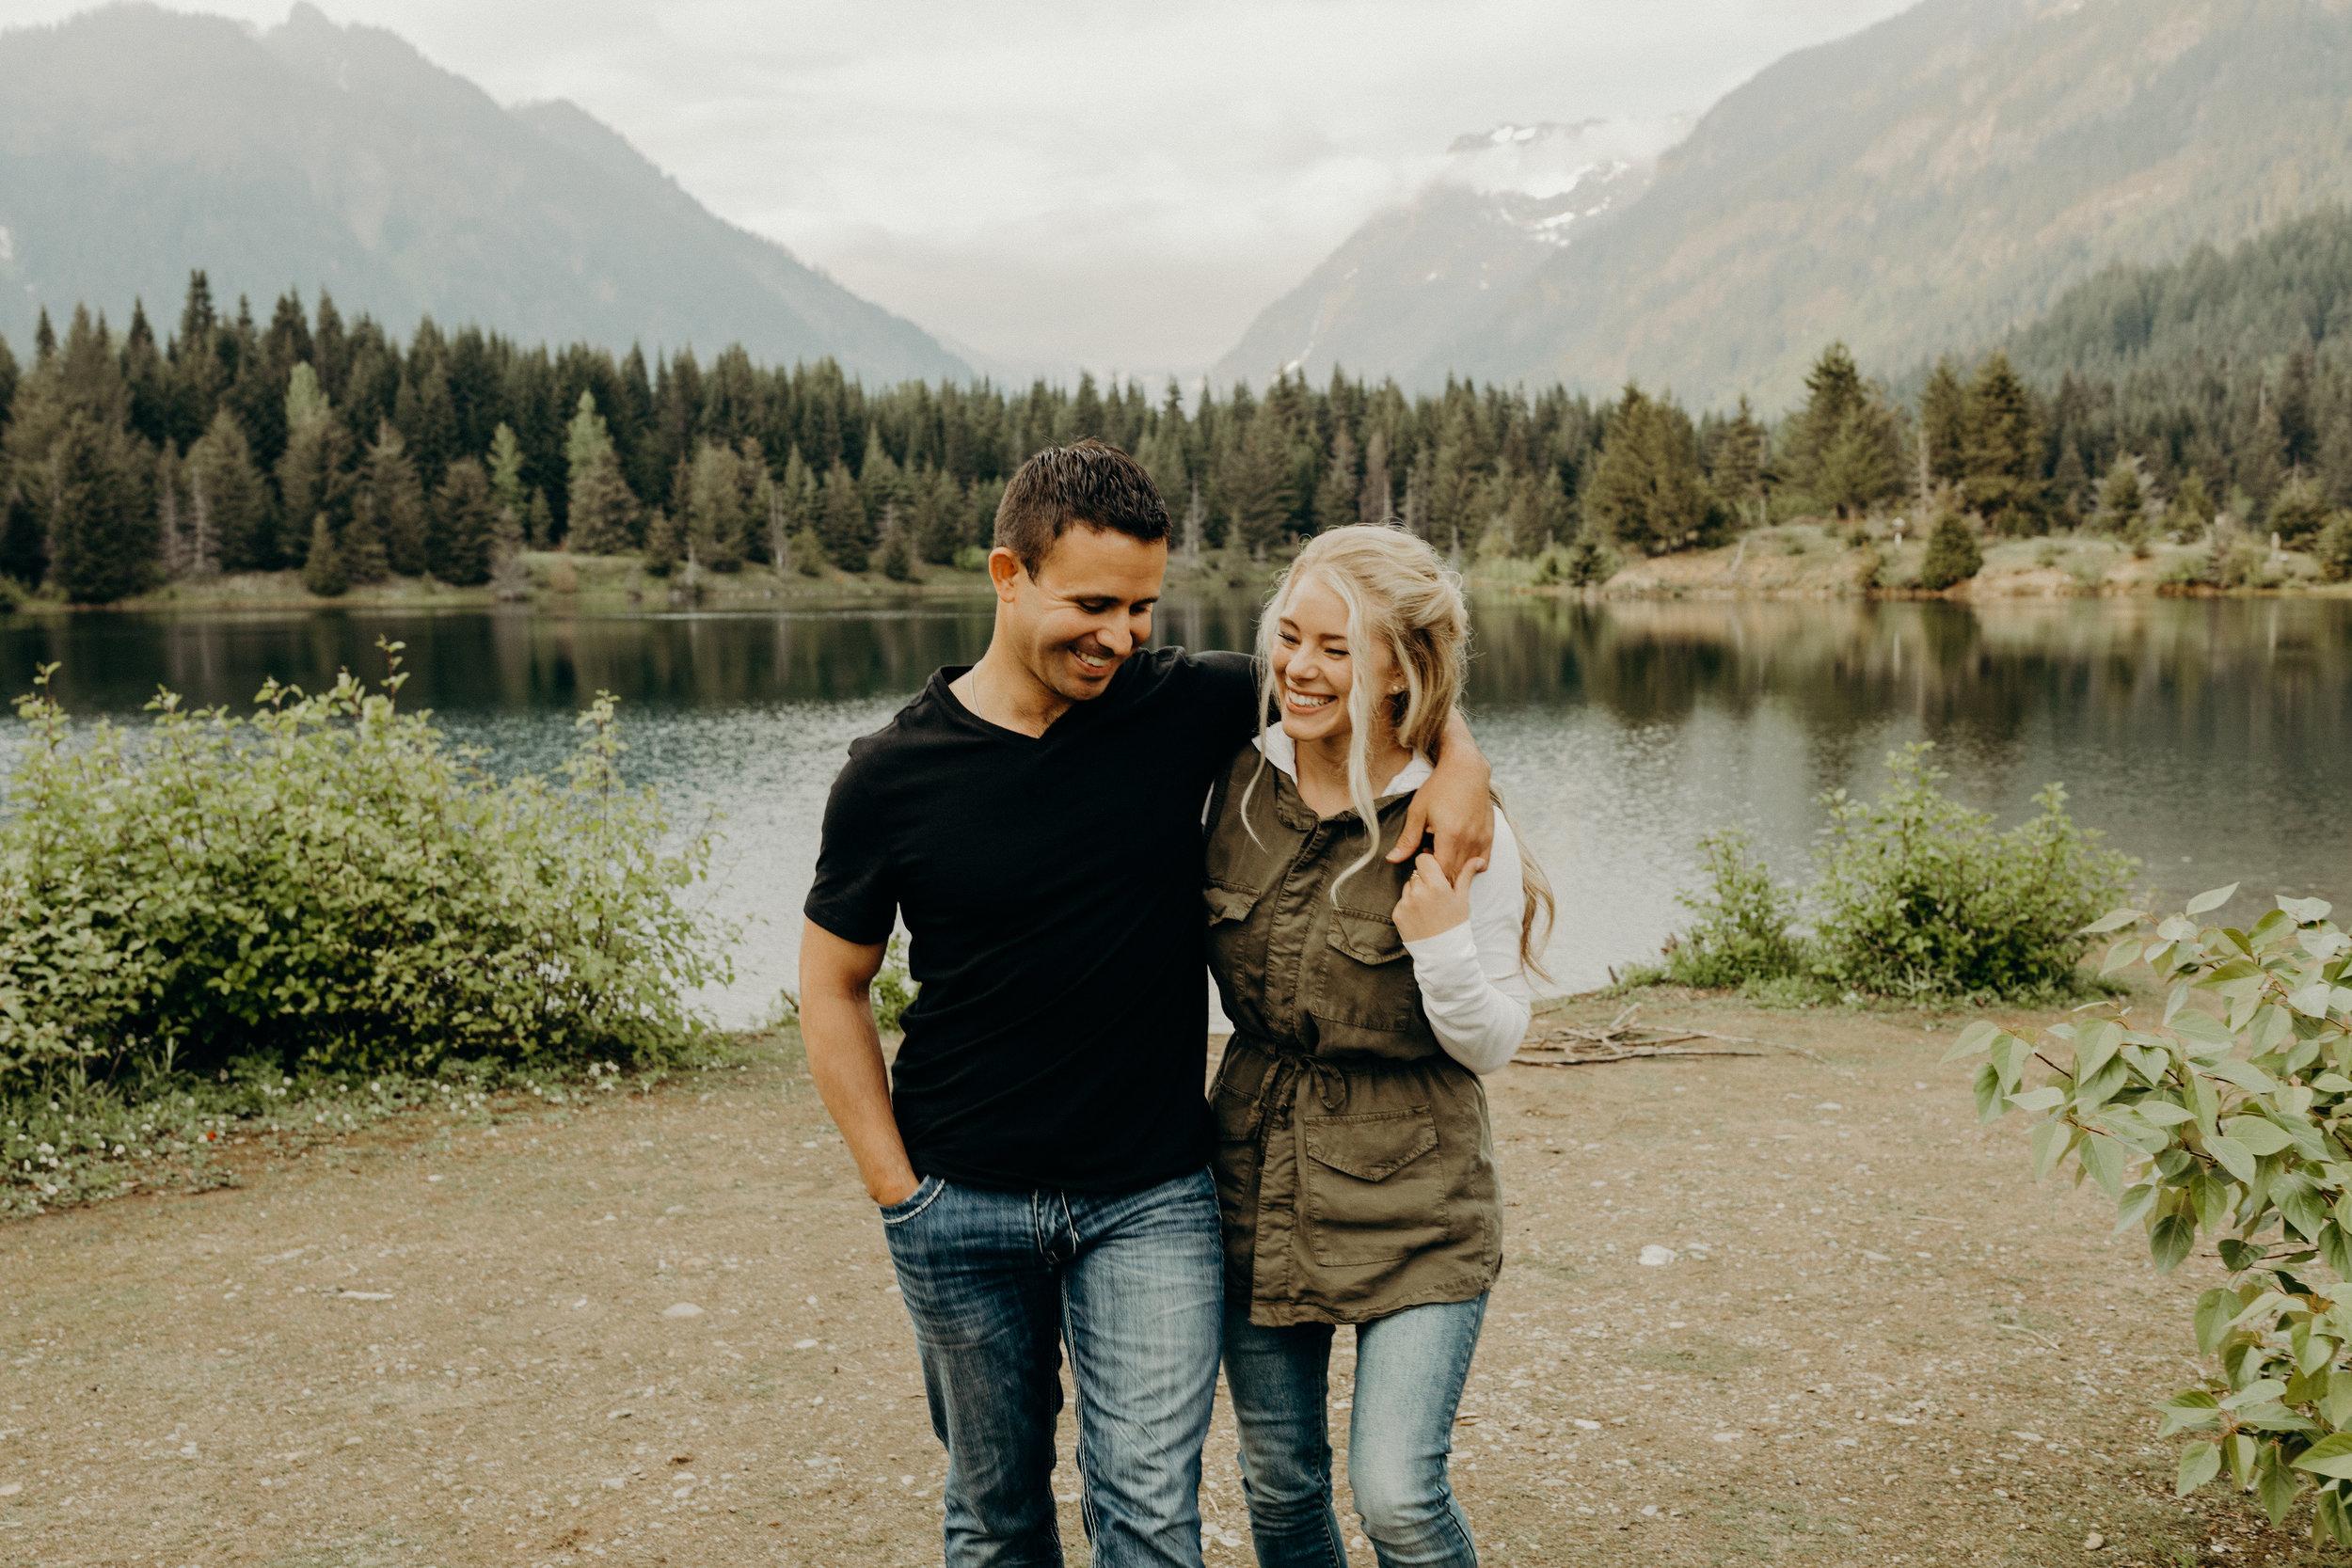 Snoqualmie-Gold-Creek-Pond-Engagement